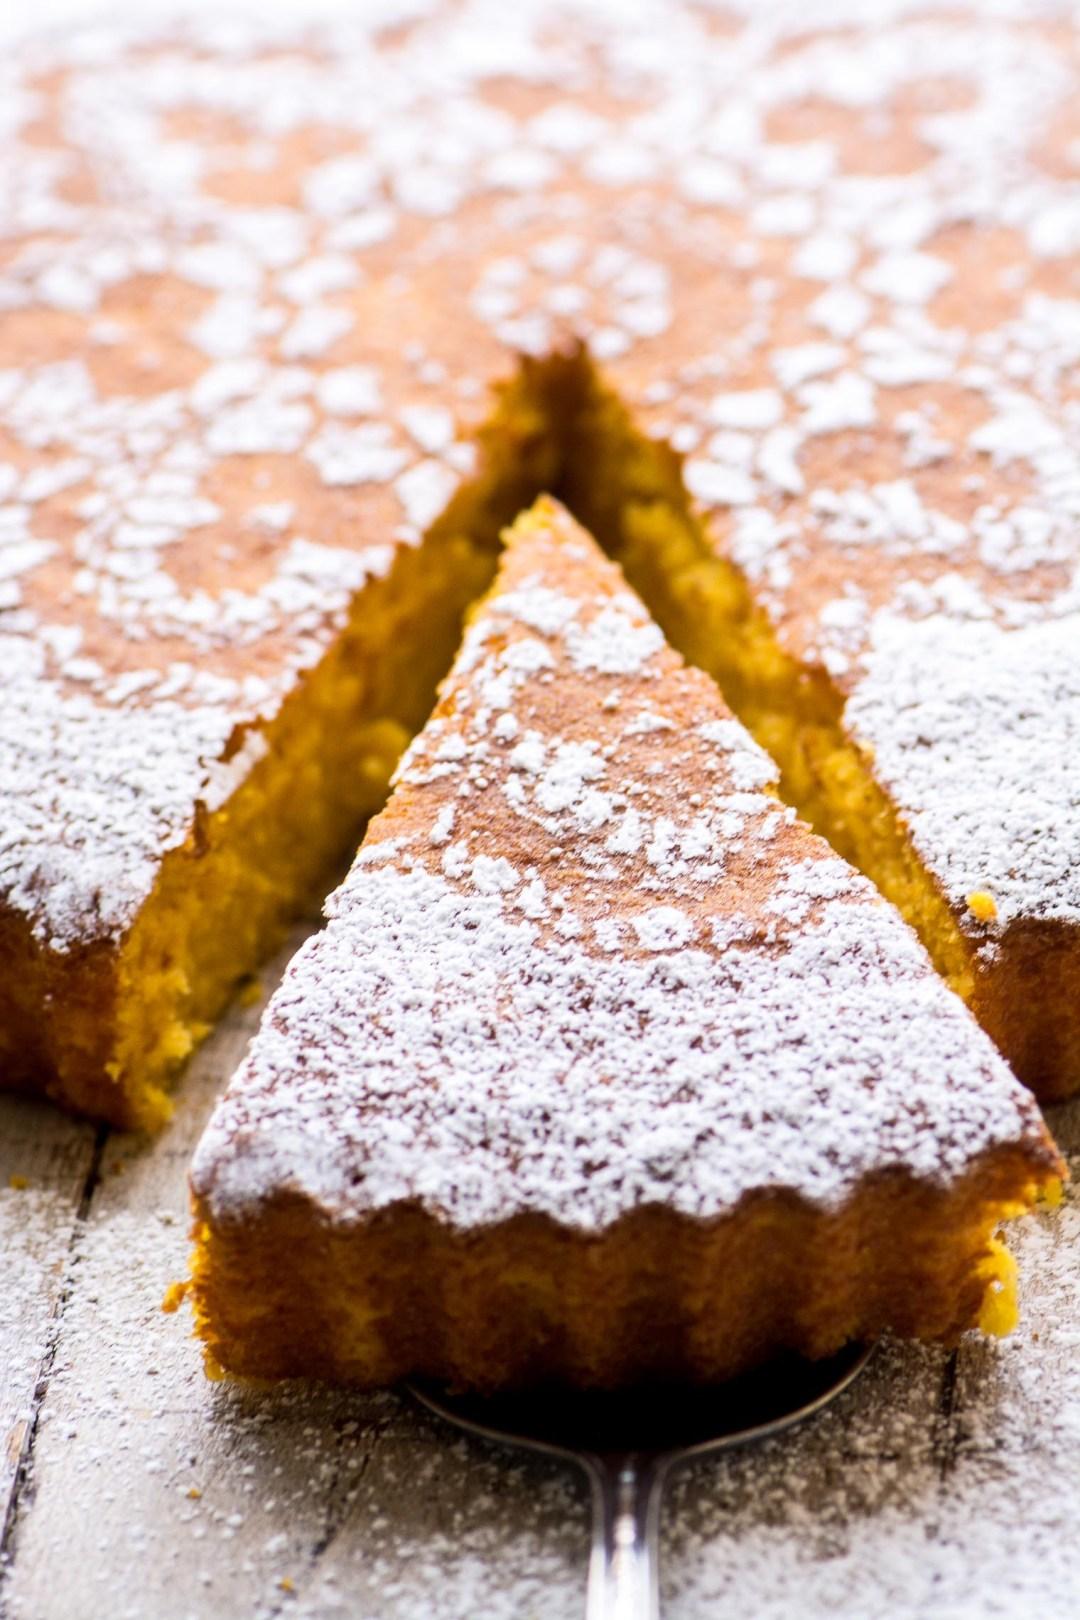 Slicing a Gluten Free Tangerine Cake